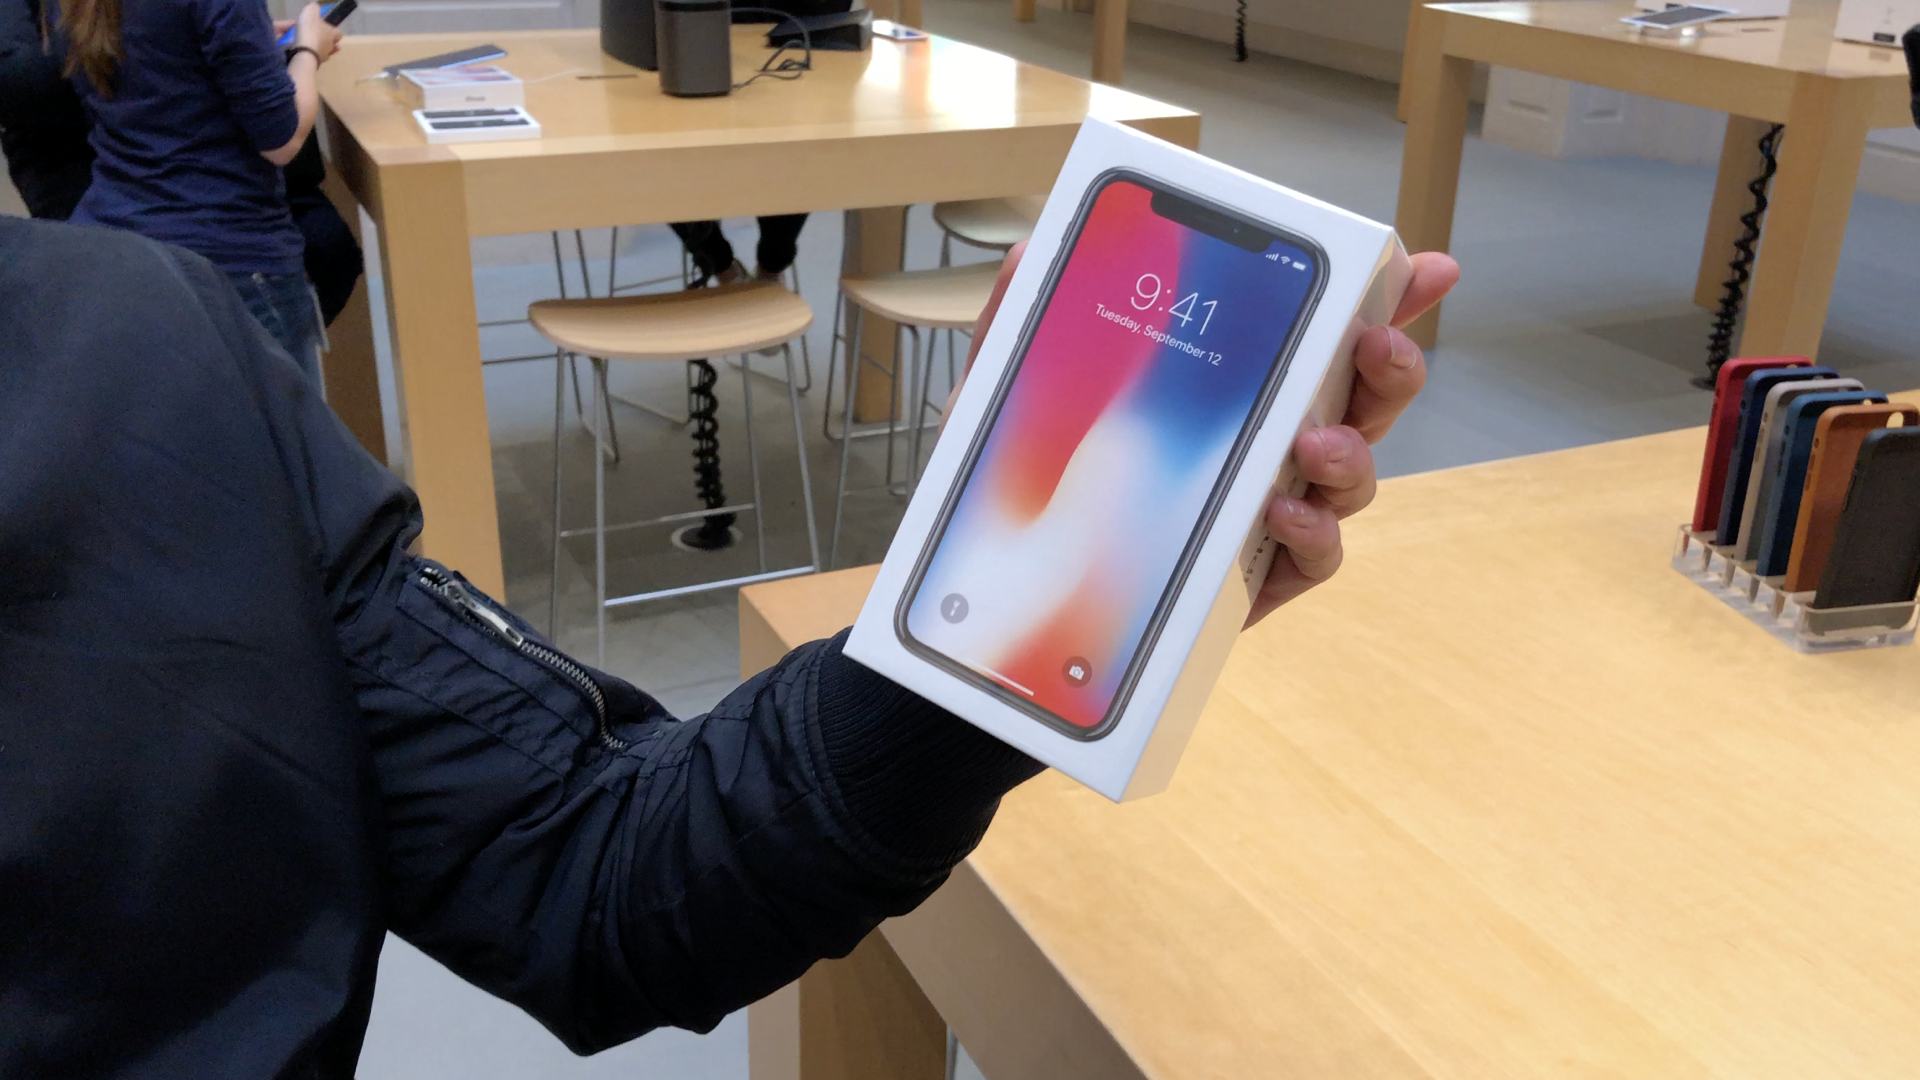 iPhone X Amsterdam alt 16x9